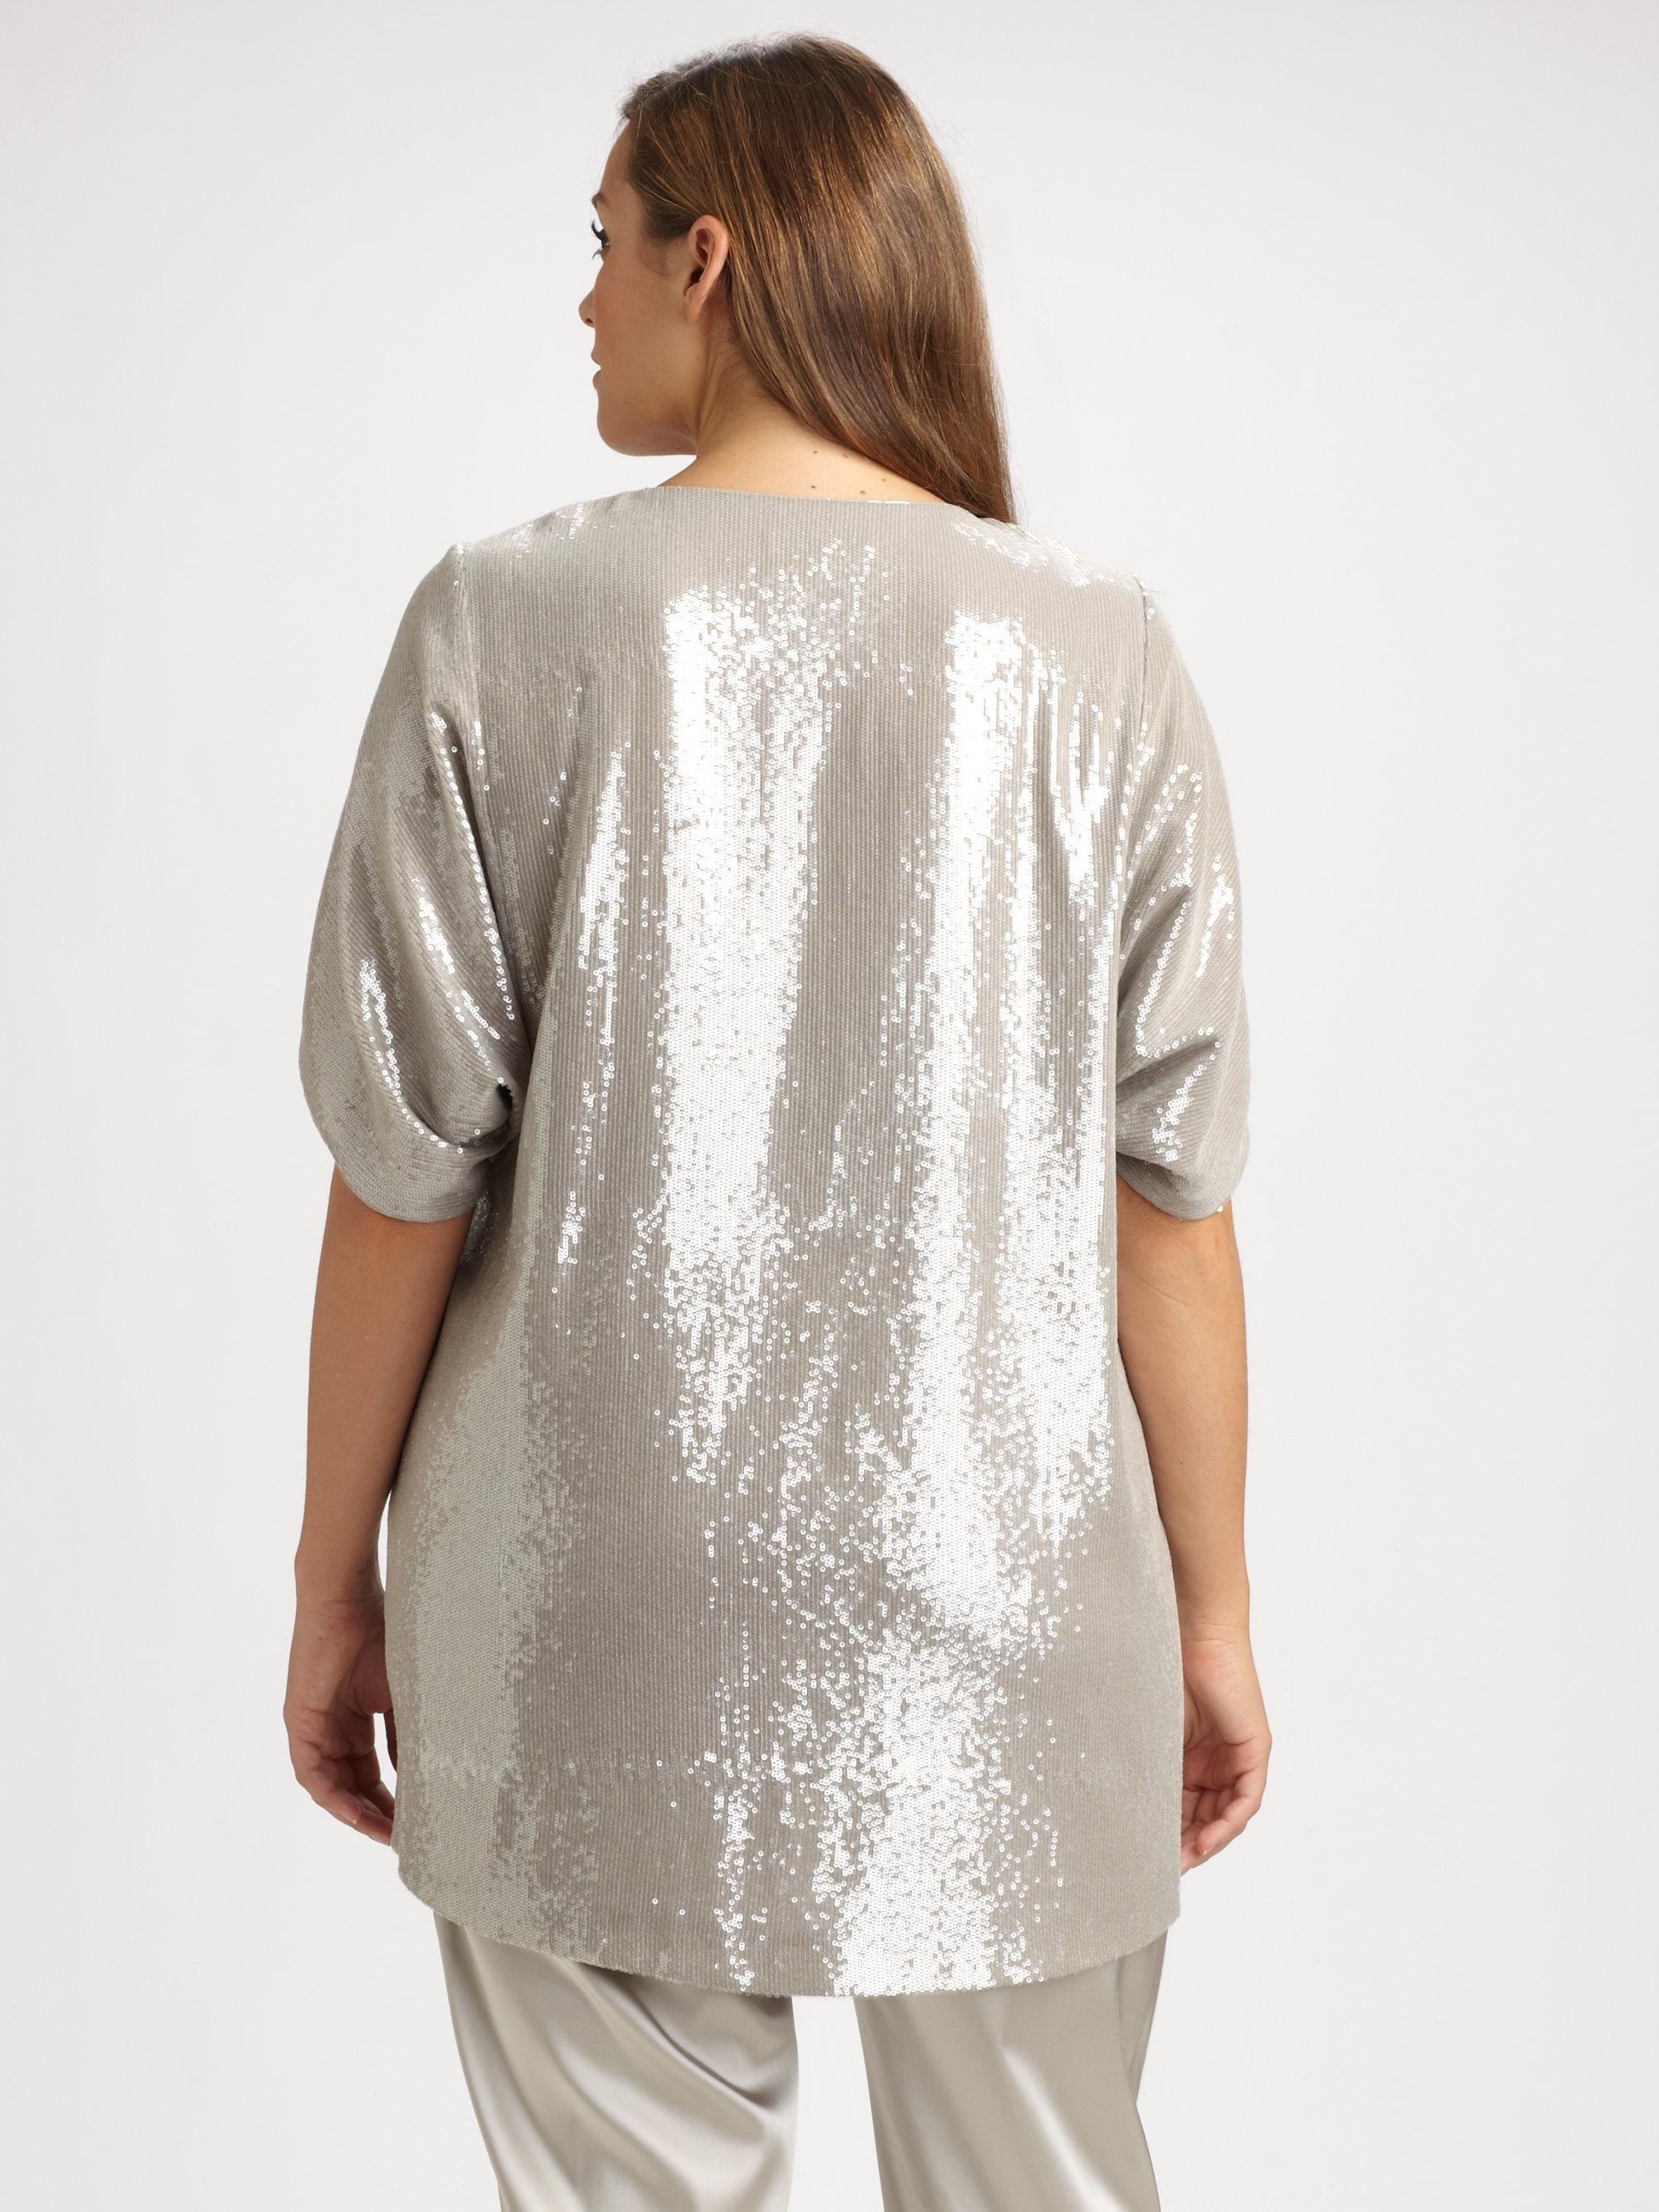 148 Best Images About Fingernail Art On Pinterest: Lafayette 148 New York Sequin Shanaya Top In Silver